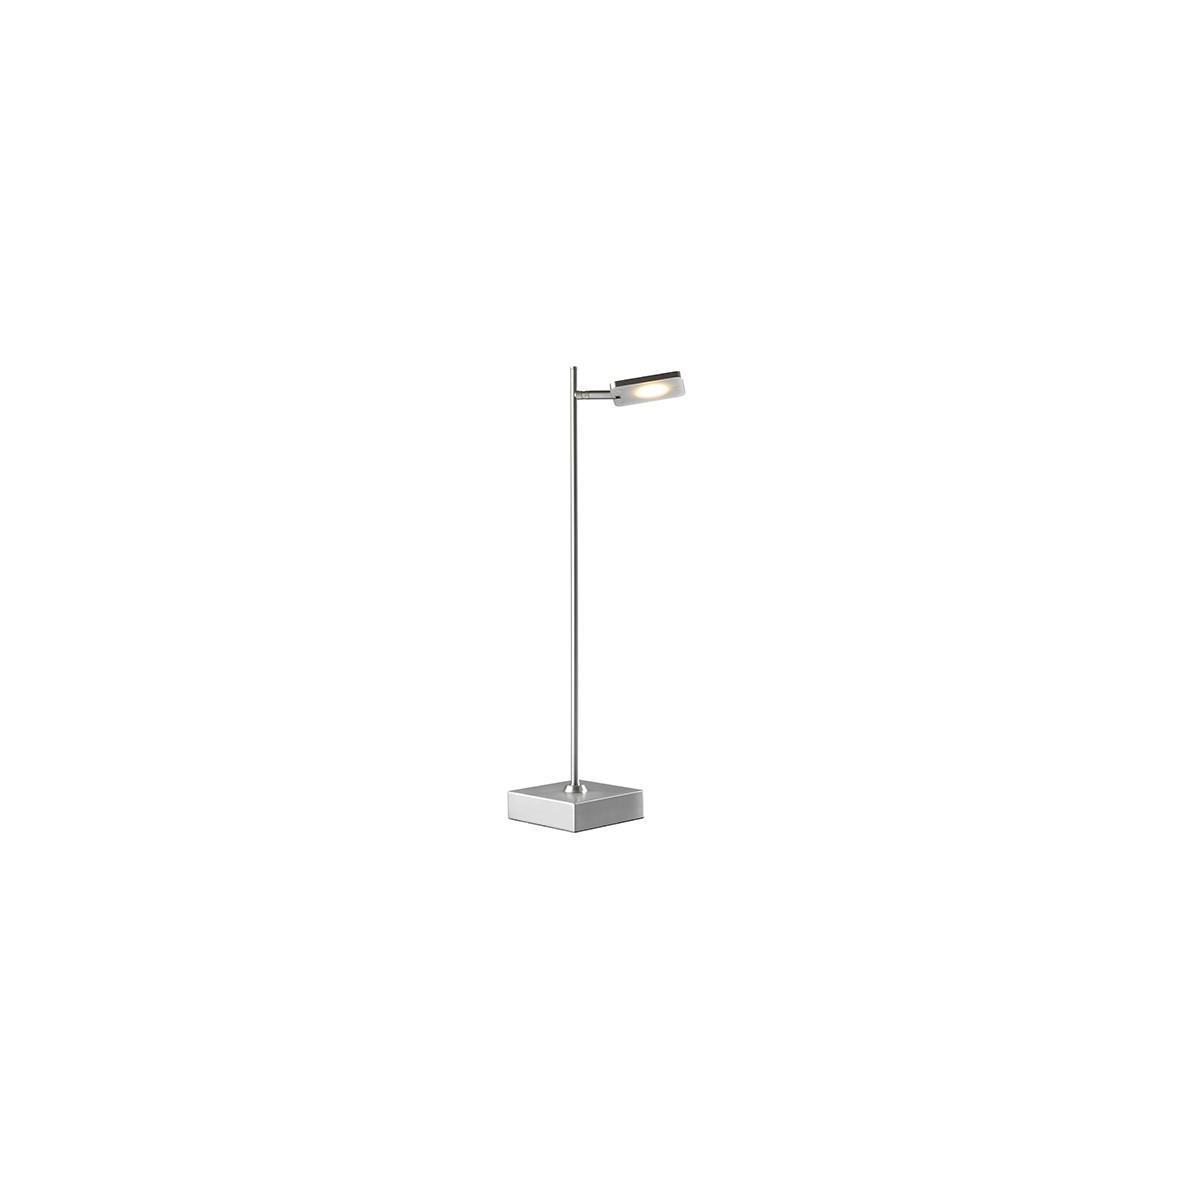 Sompex Quad LED Tischleuchte, Metall